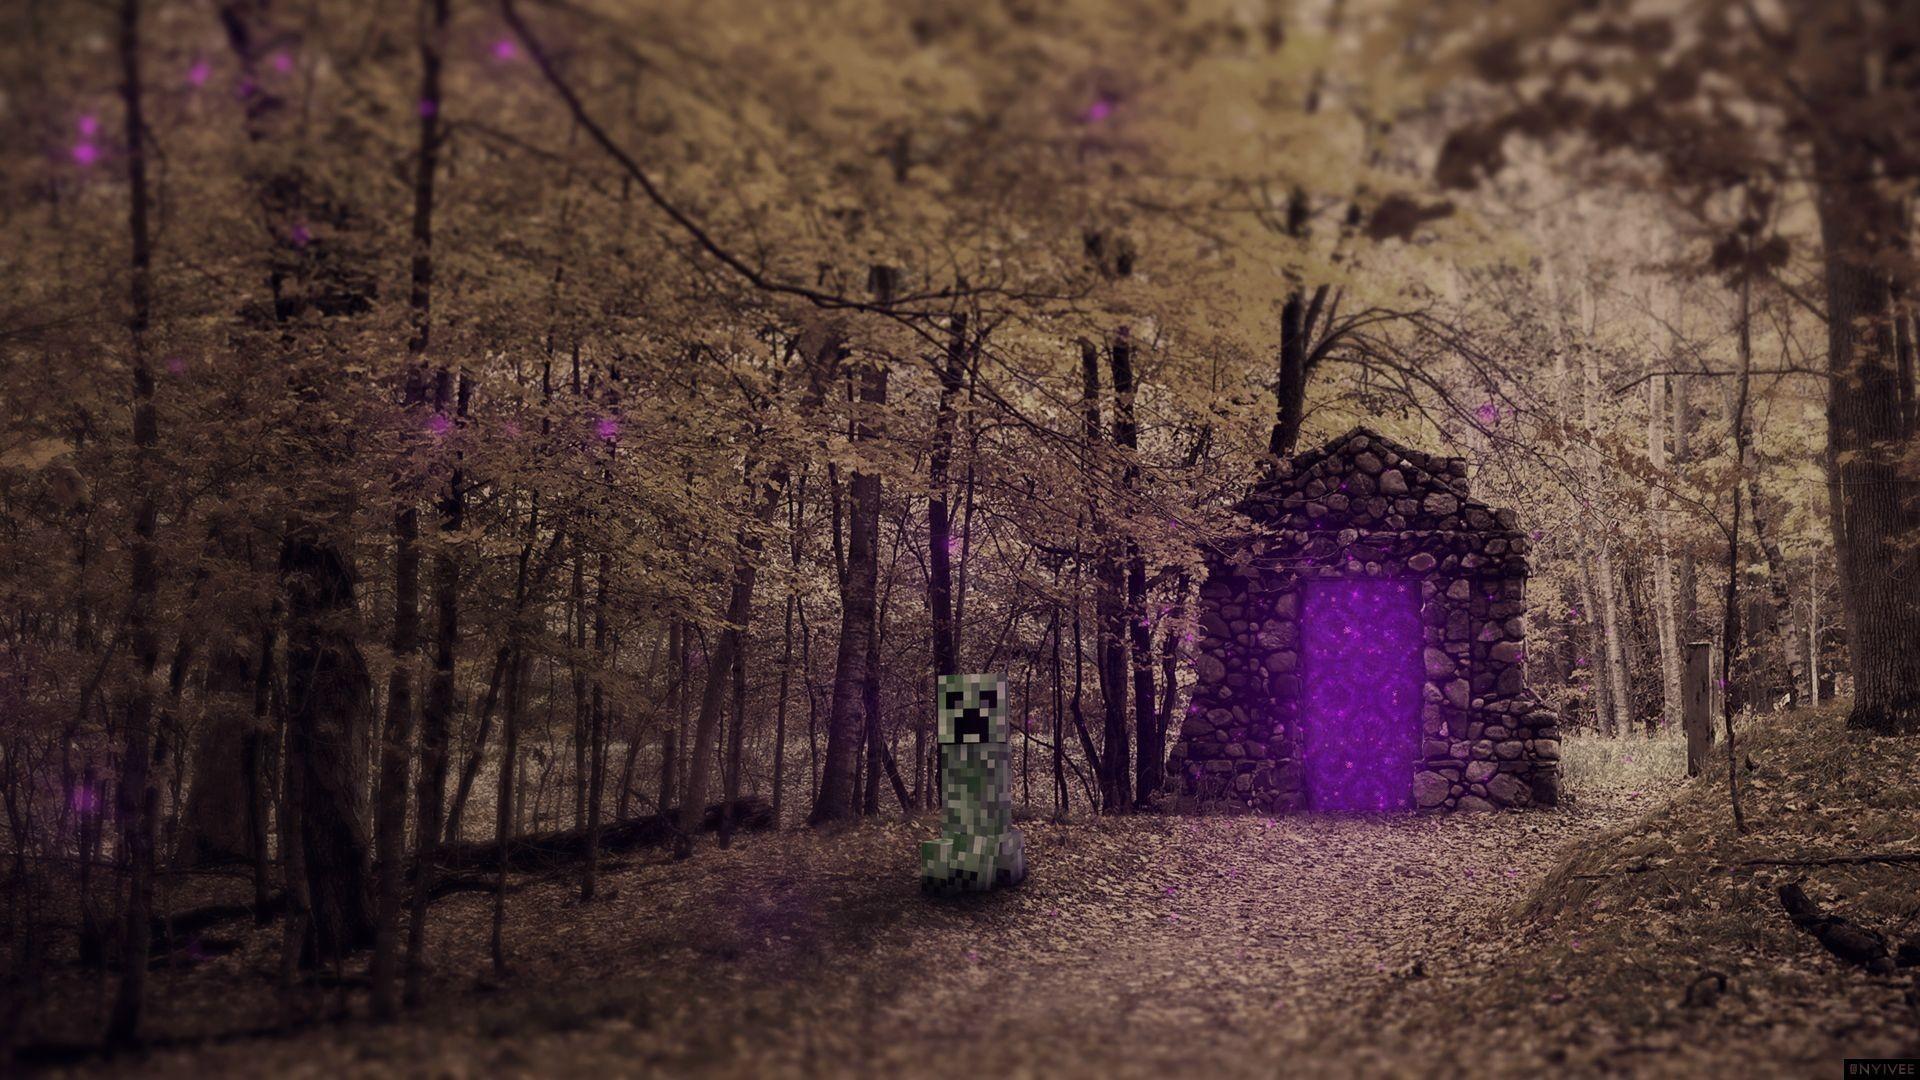 Beautiful Wallpaper Minecraft Autumn - sunlight-forest-night-nature-branch-Minecraft-evening-morning-cherry-blossom-blossom-spring-light-tree-autumn-leaf-flower-plant-season-darkness-woodland-168168  Image_97214.jpg